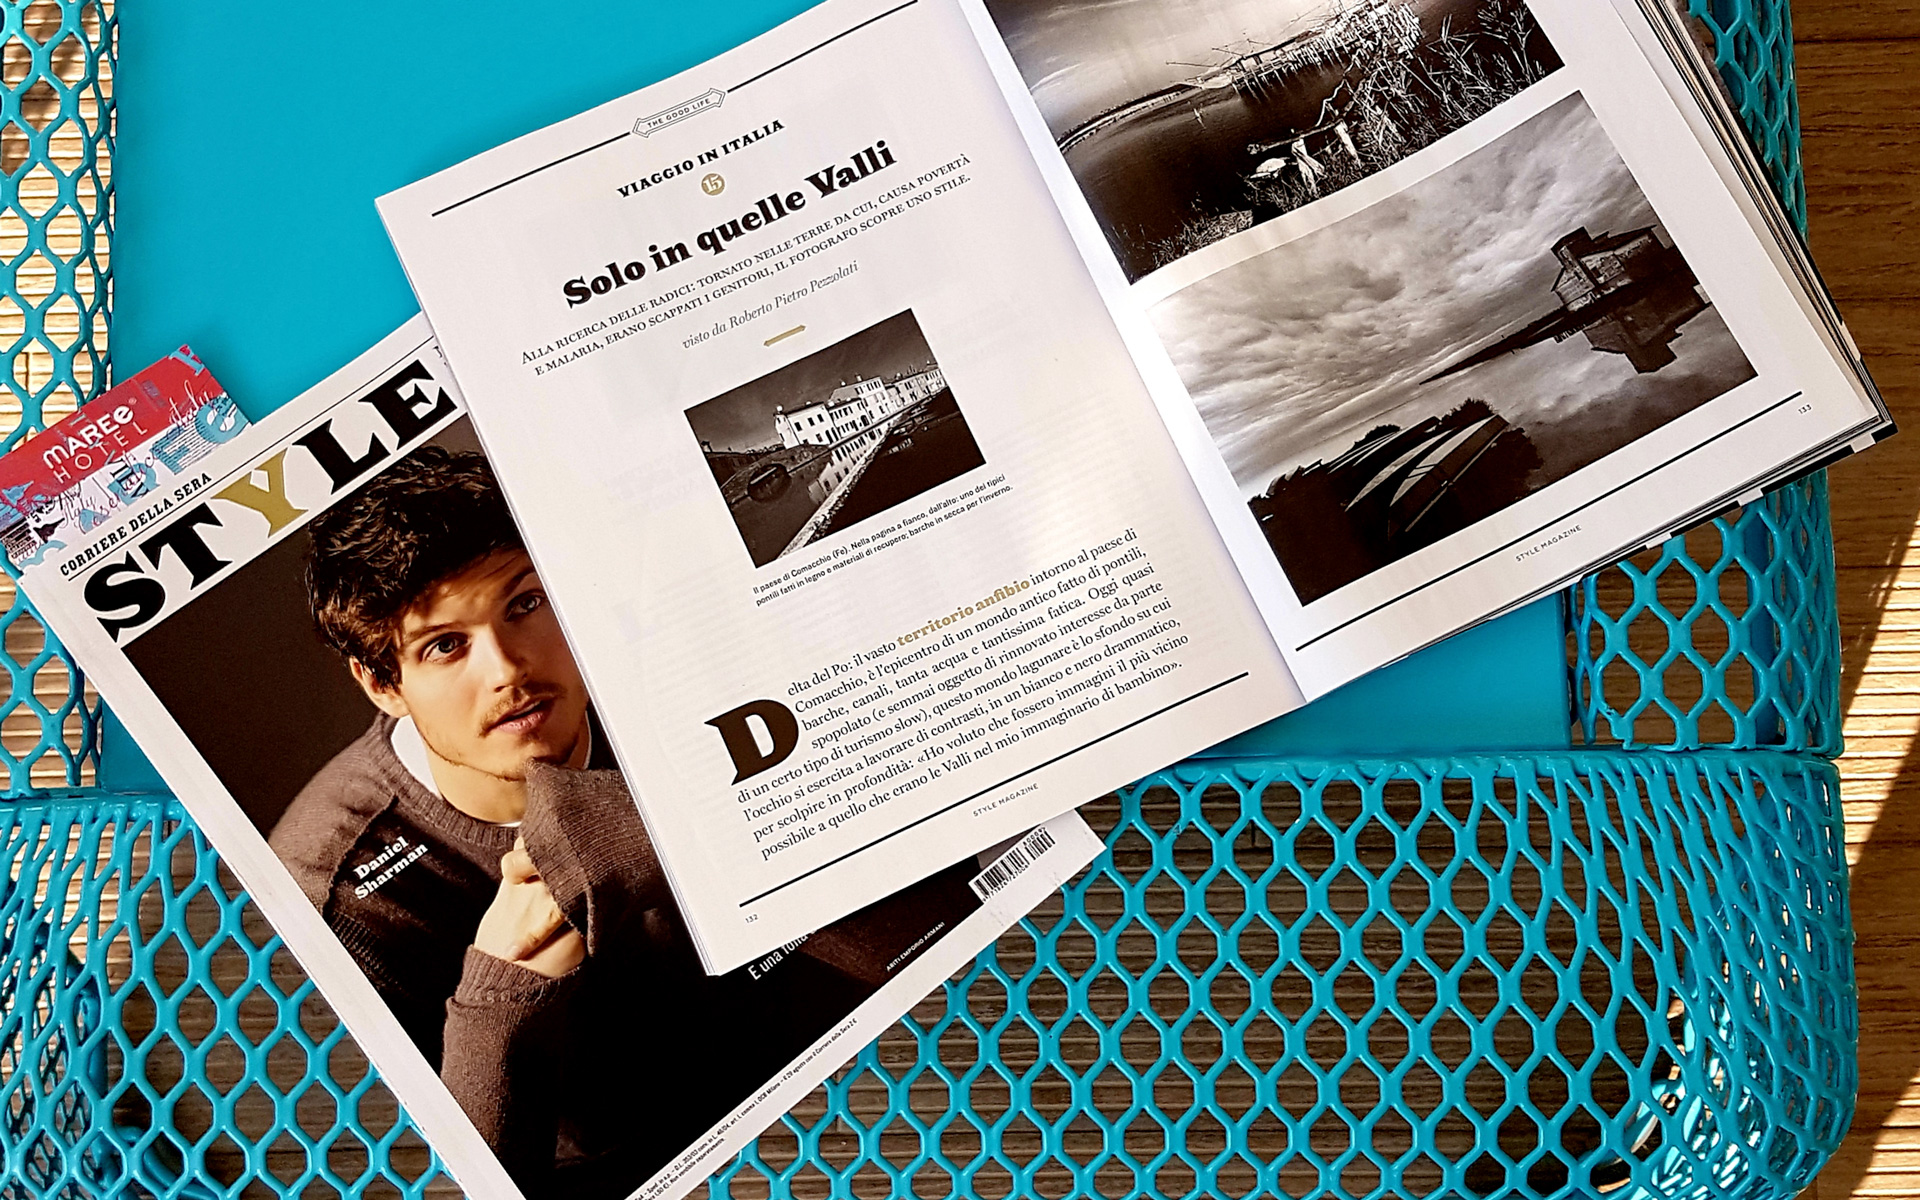 Roberto Pietro Pezzolati / Articles - Quelle Valli